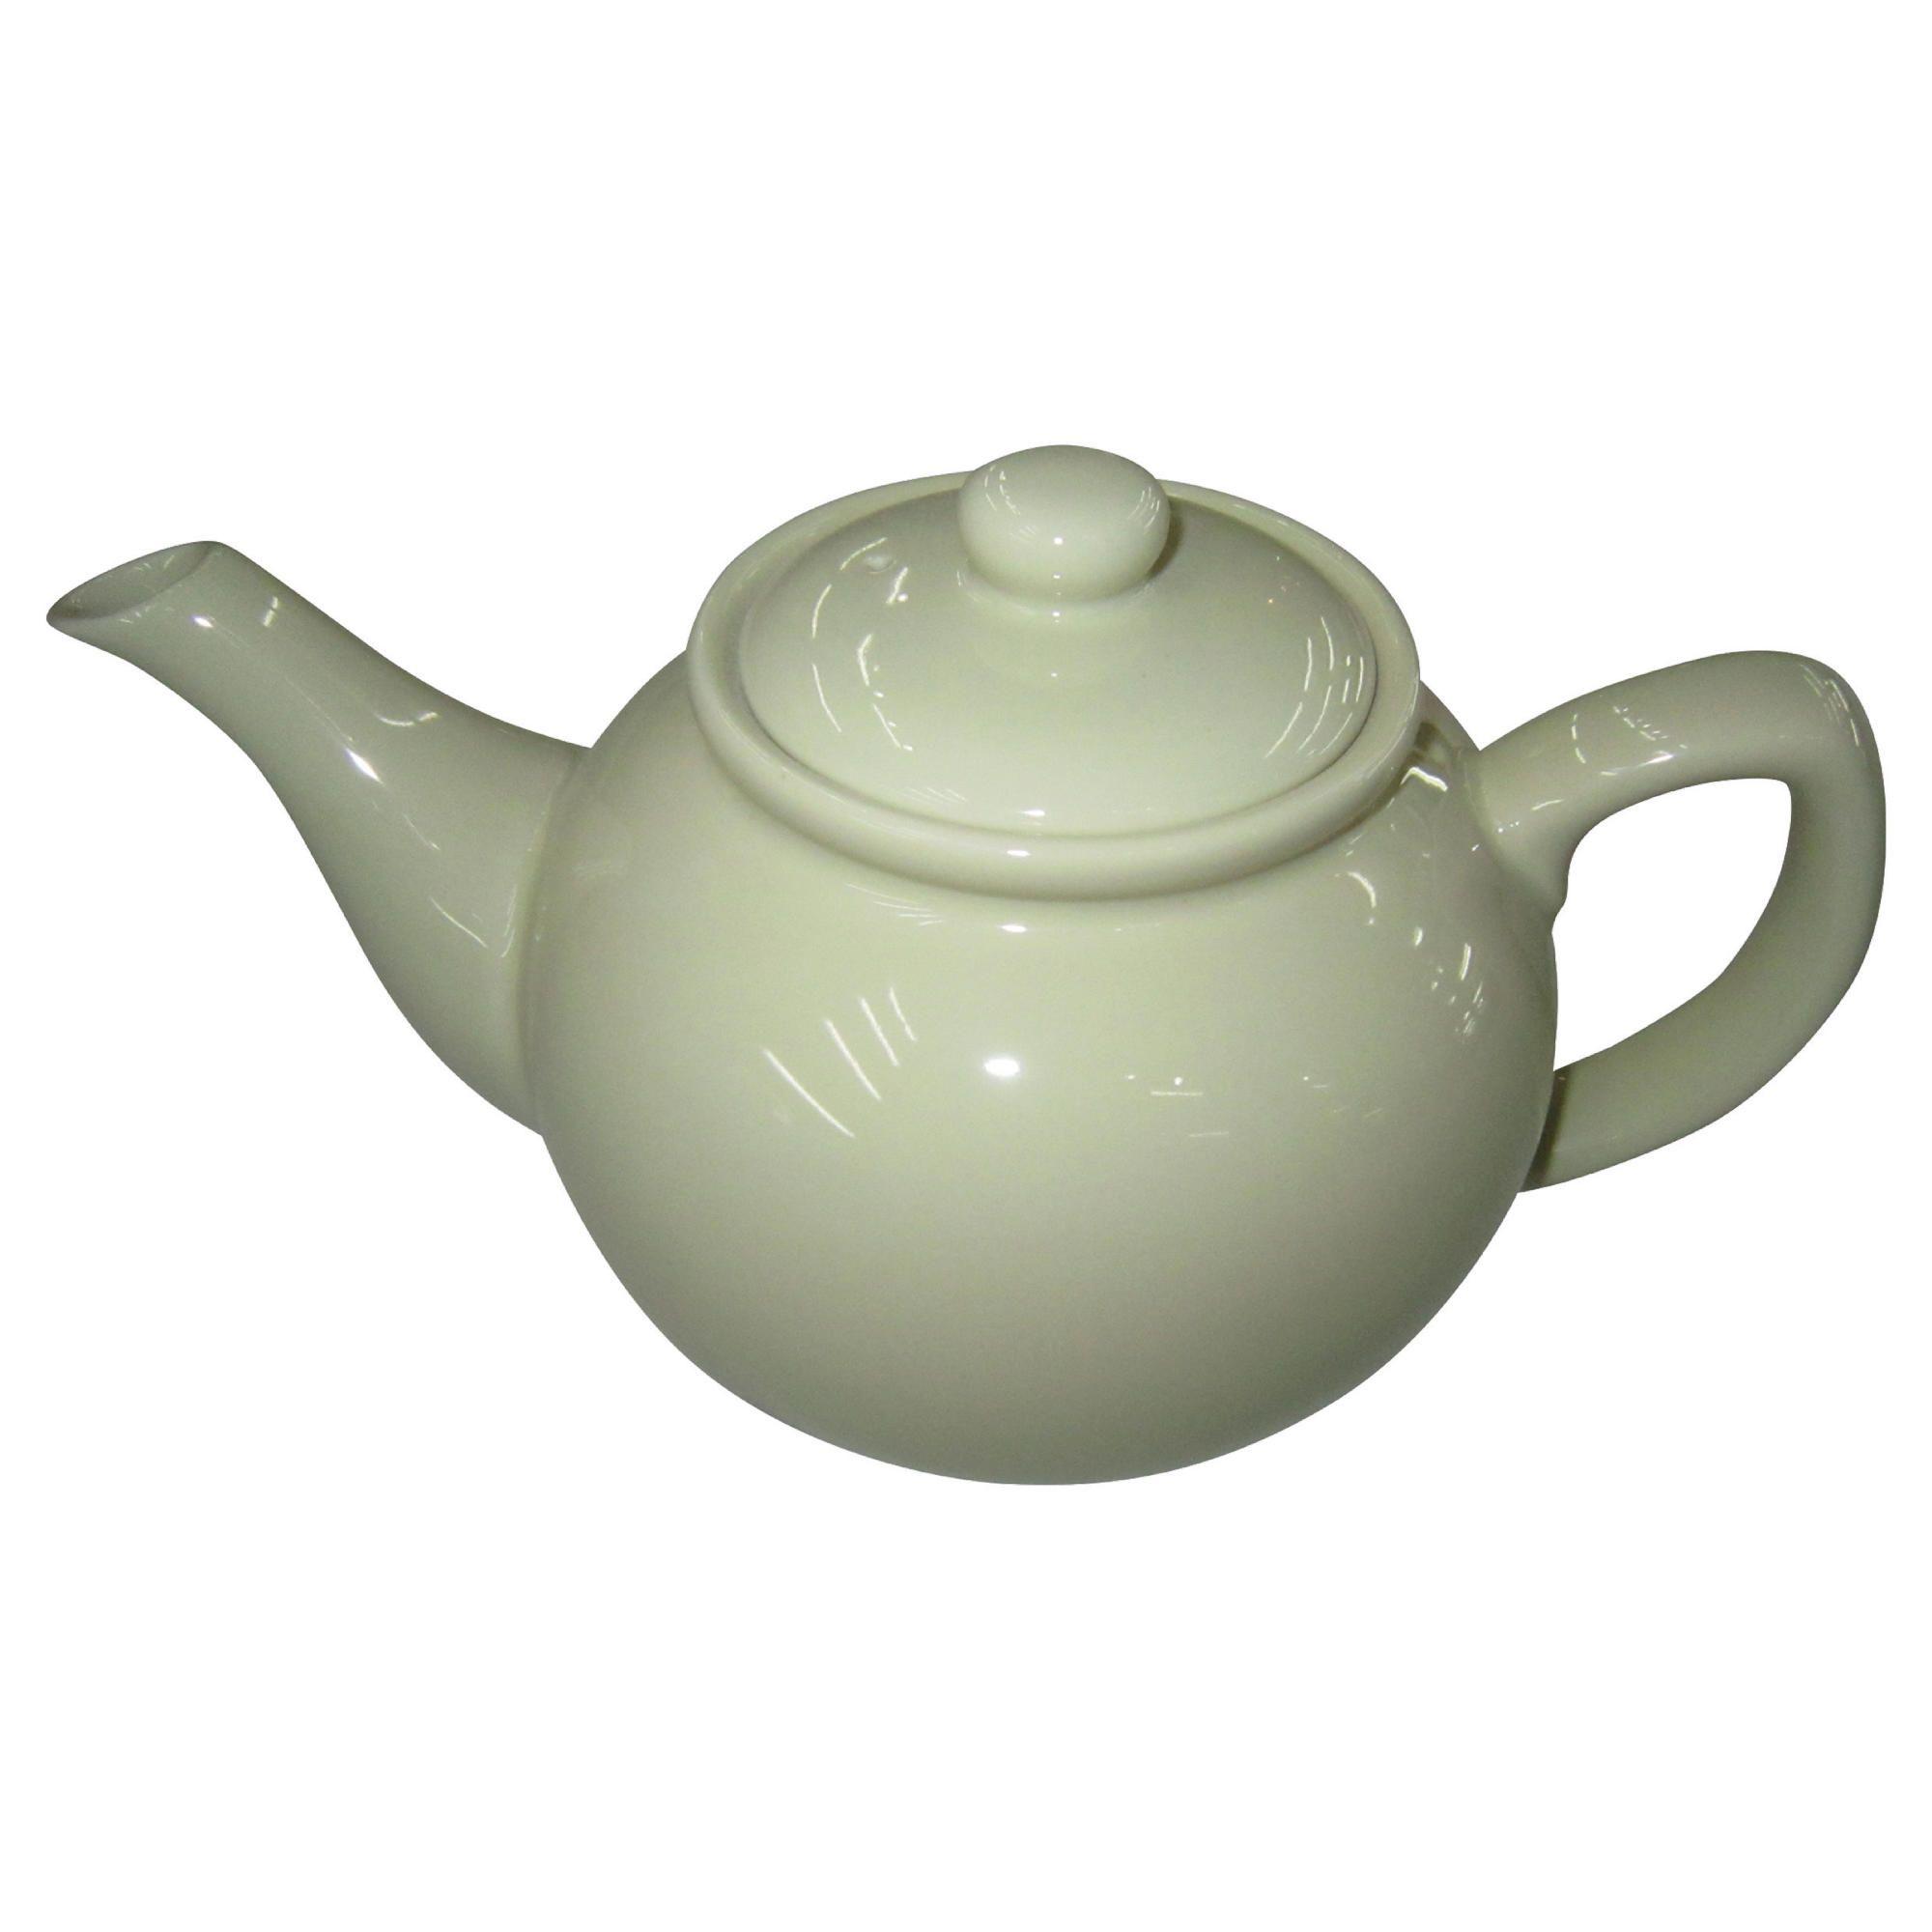 Tesco Teapot, Cream